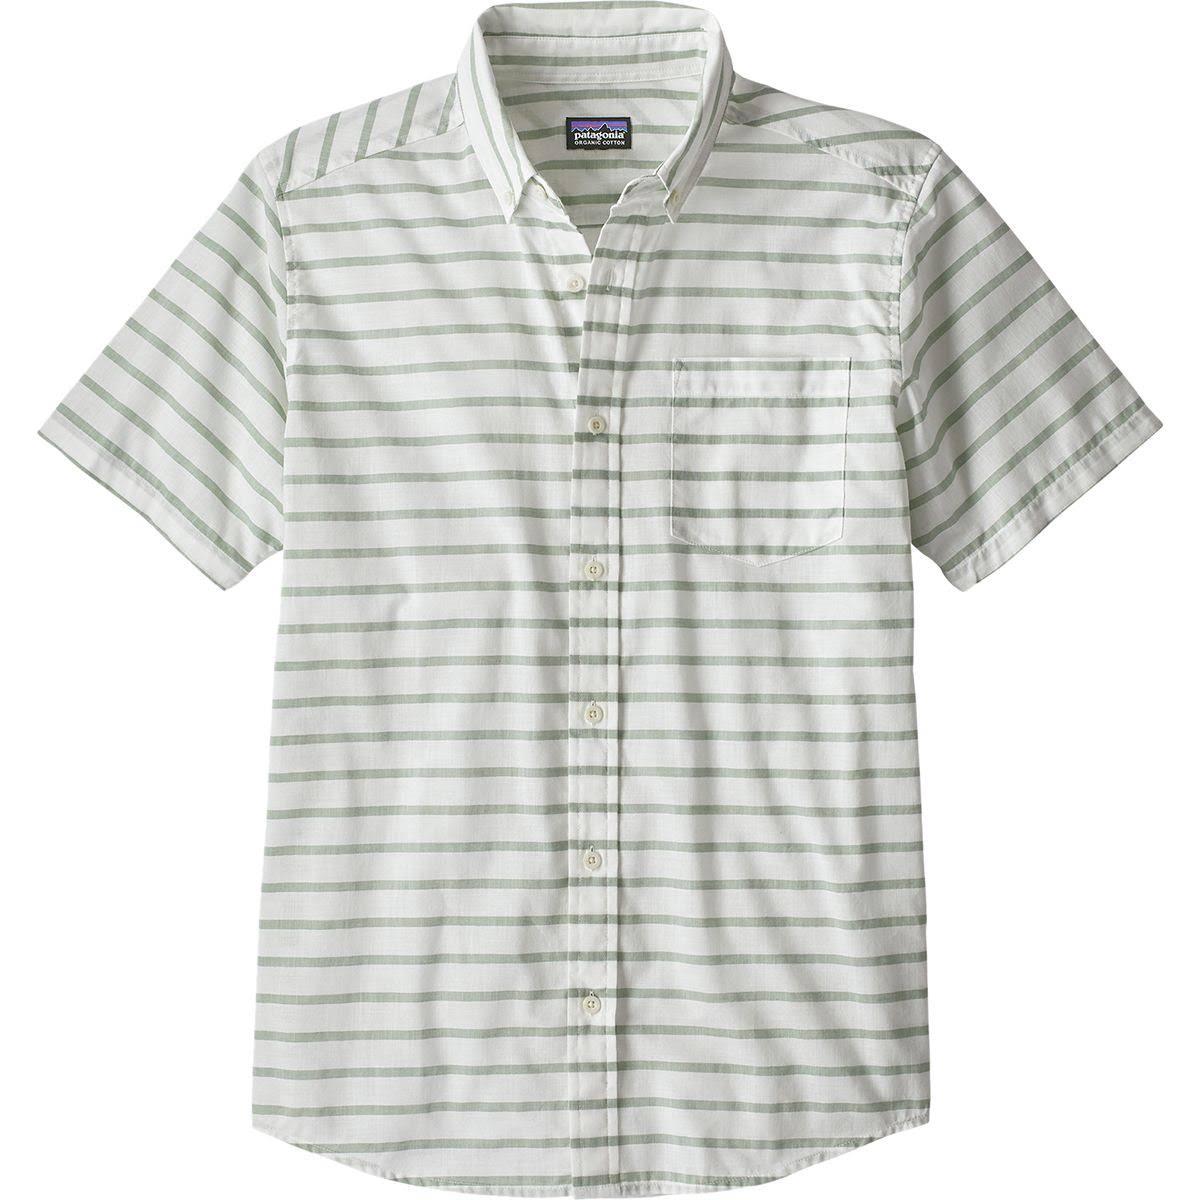 Herren S Bluffside Grün Patagonia Shirt 54121 Leichtes wHqdfS